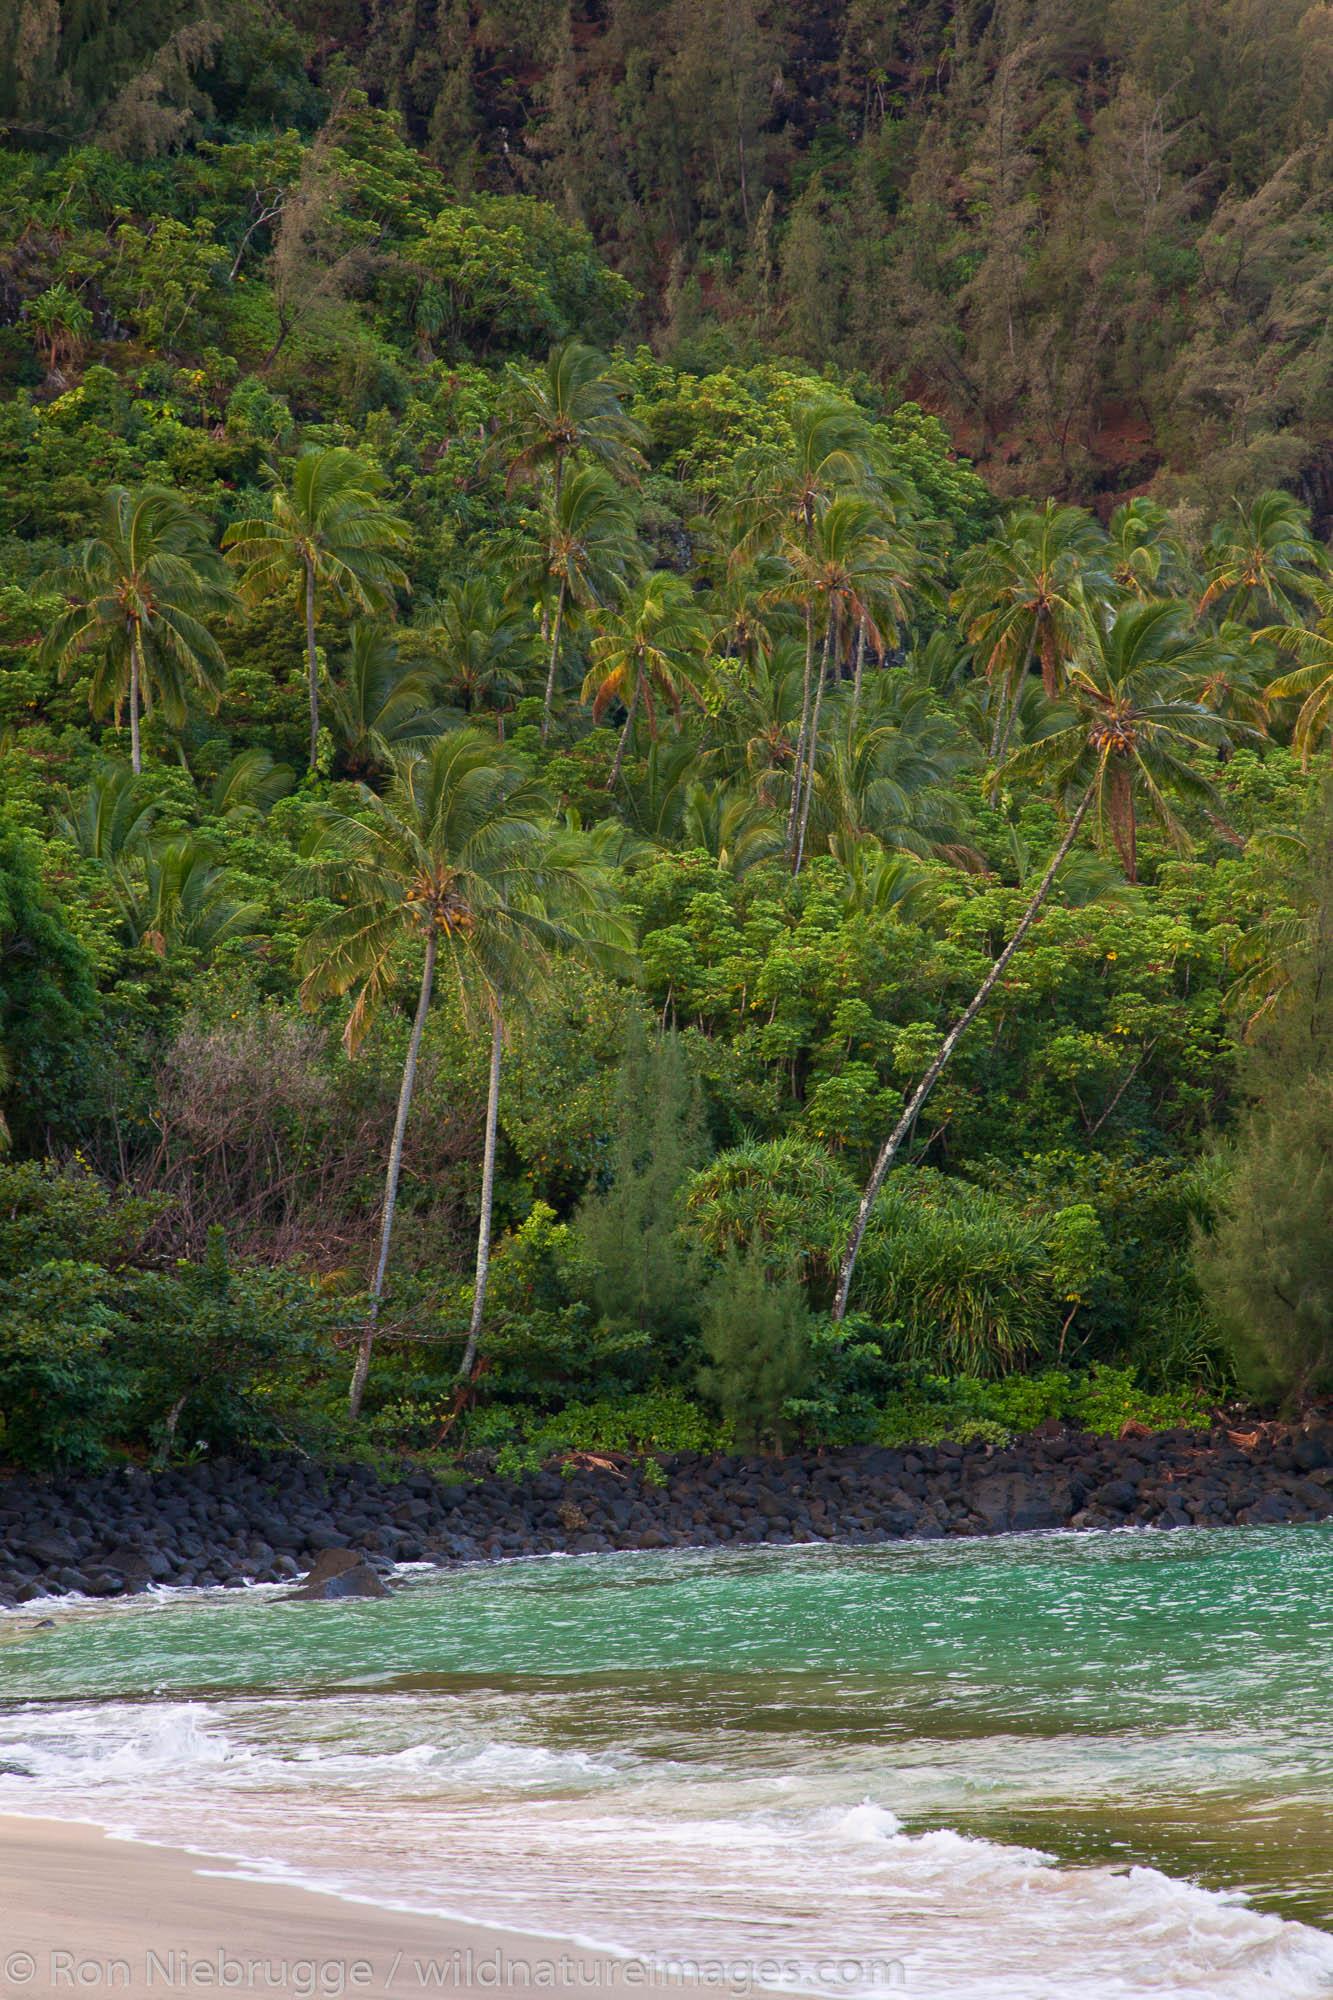 Ke'e Beach at the beginning of the Na Pali Coast, Kauai, Hawaii.